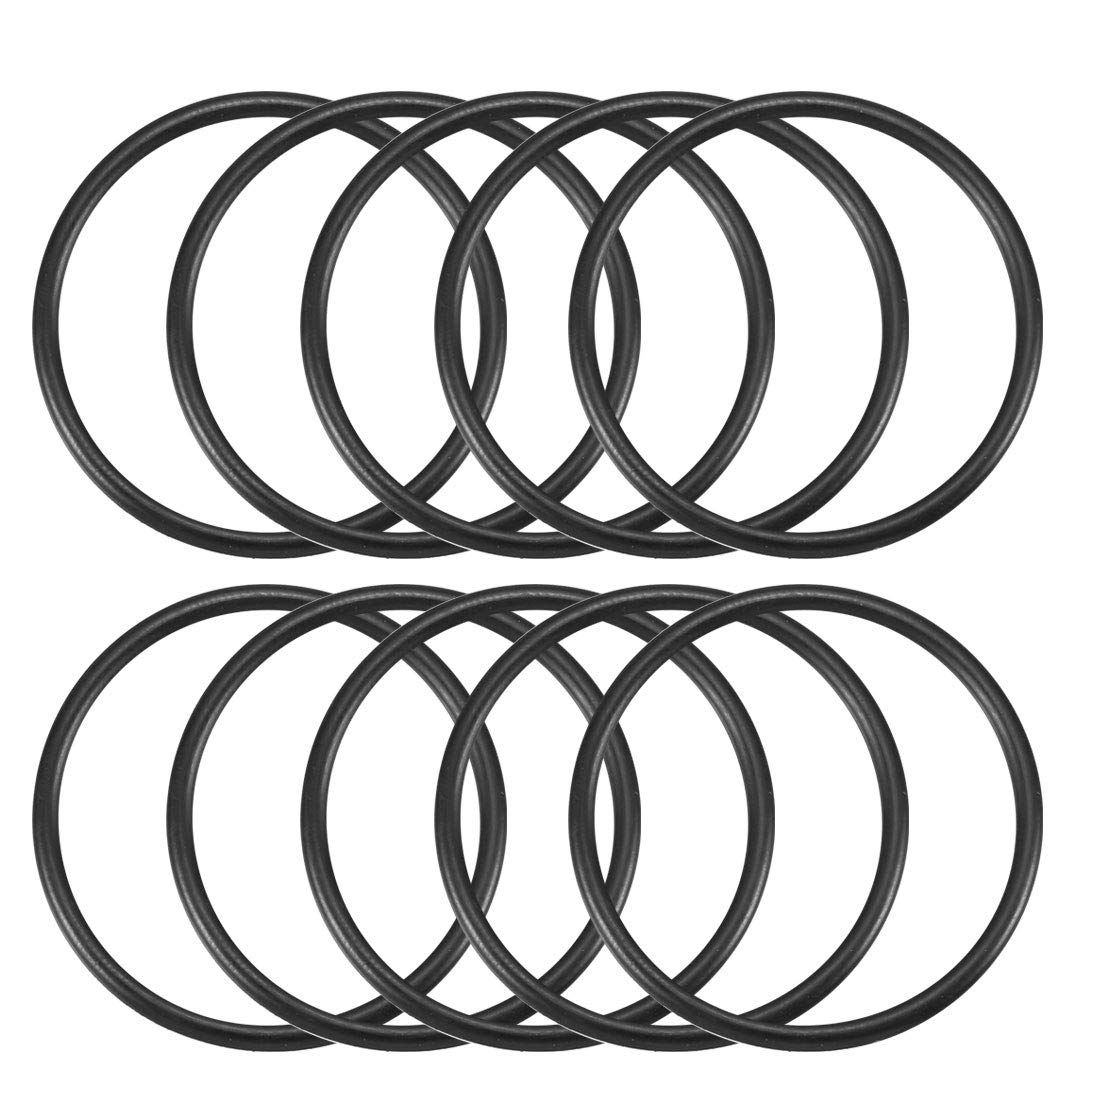 uxcell Nitrile Rubber O-Rings 24mm OD 20mm ID 2mm Width Metric Buna-N Sealing Gasket Pack of 30